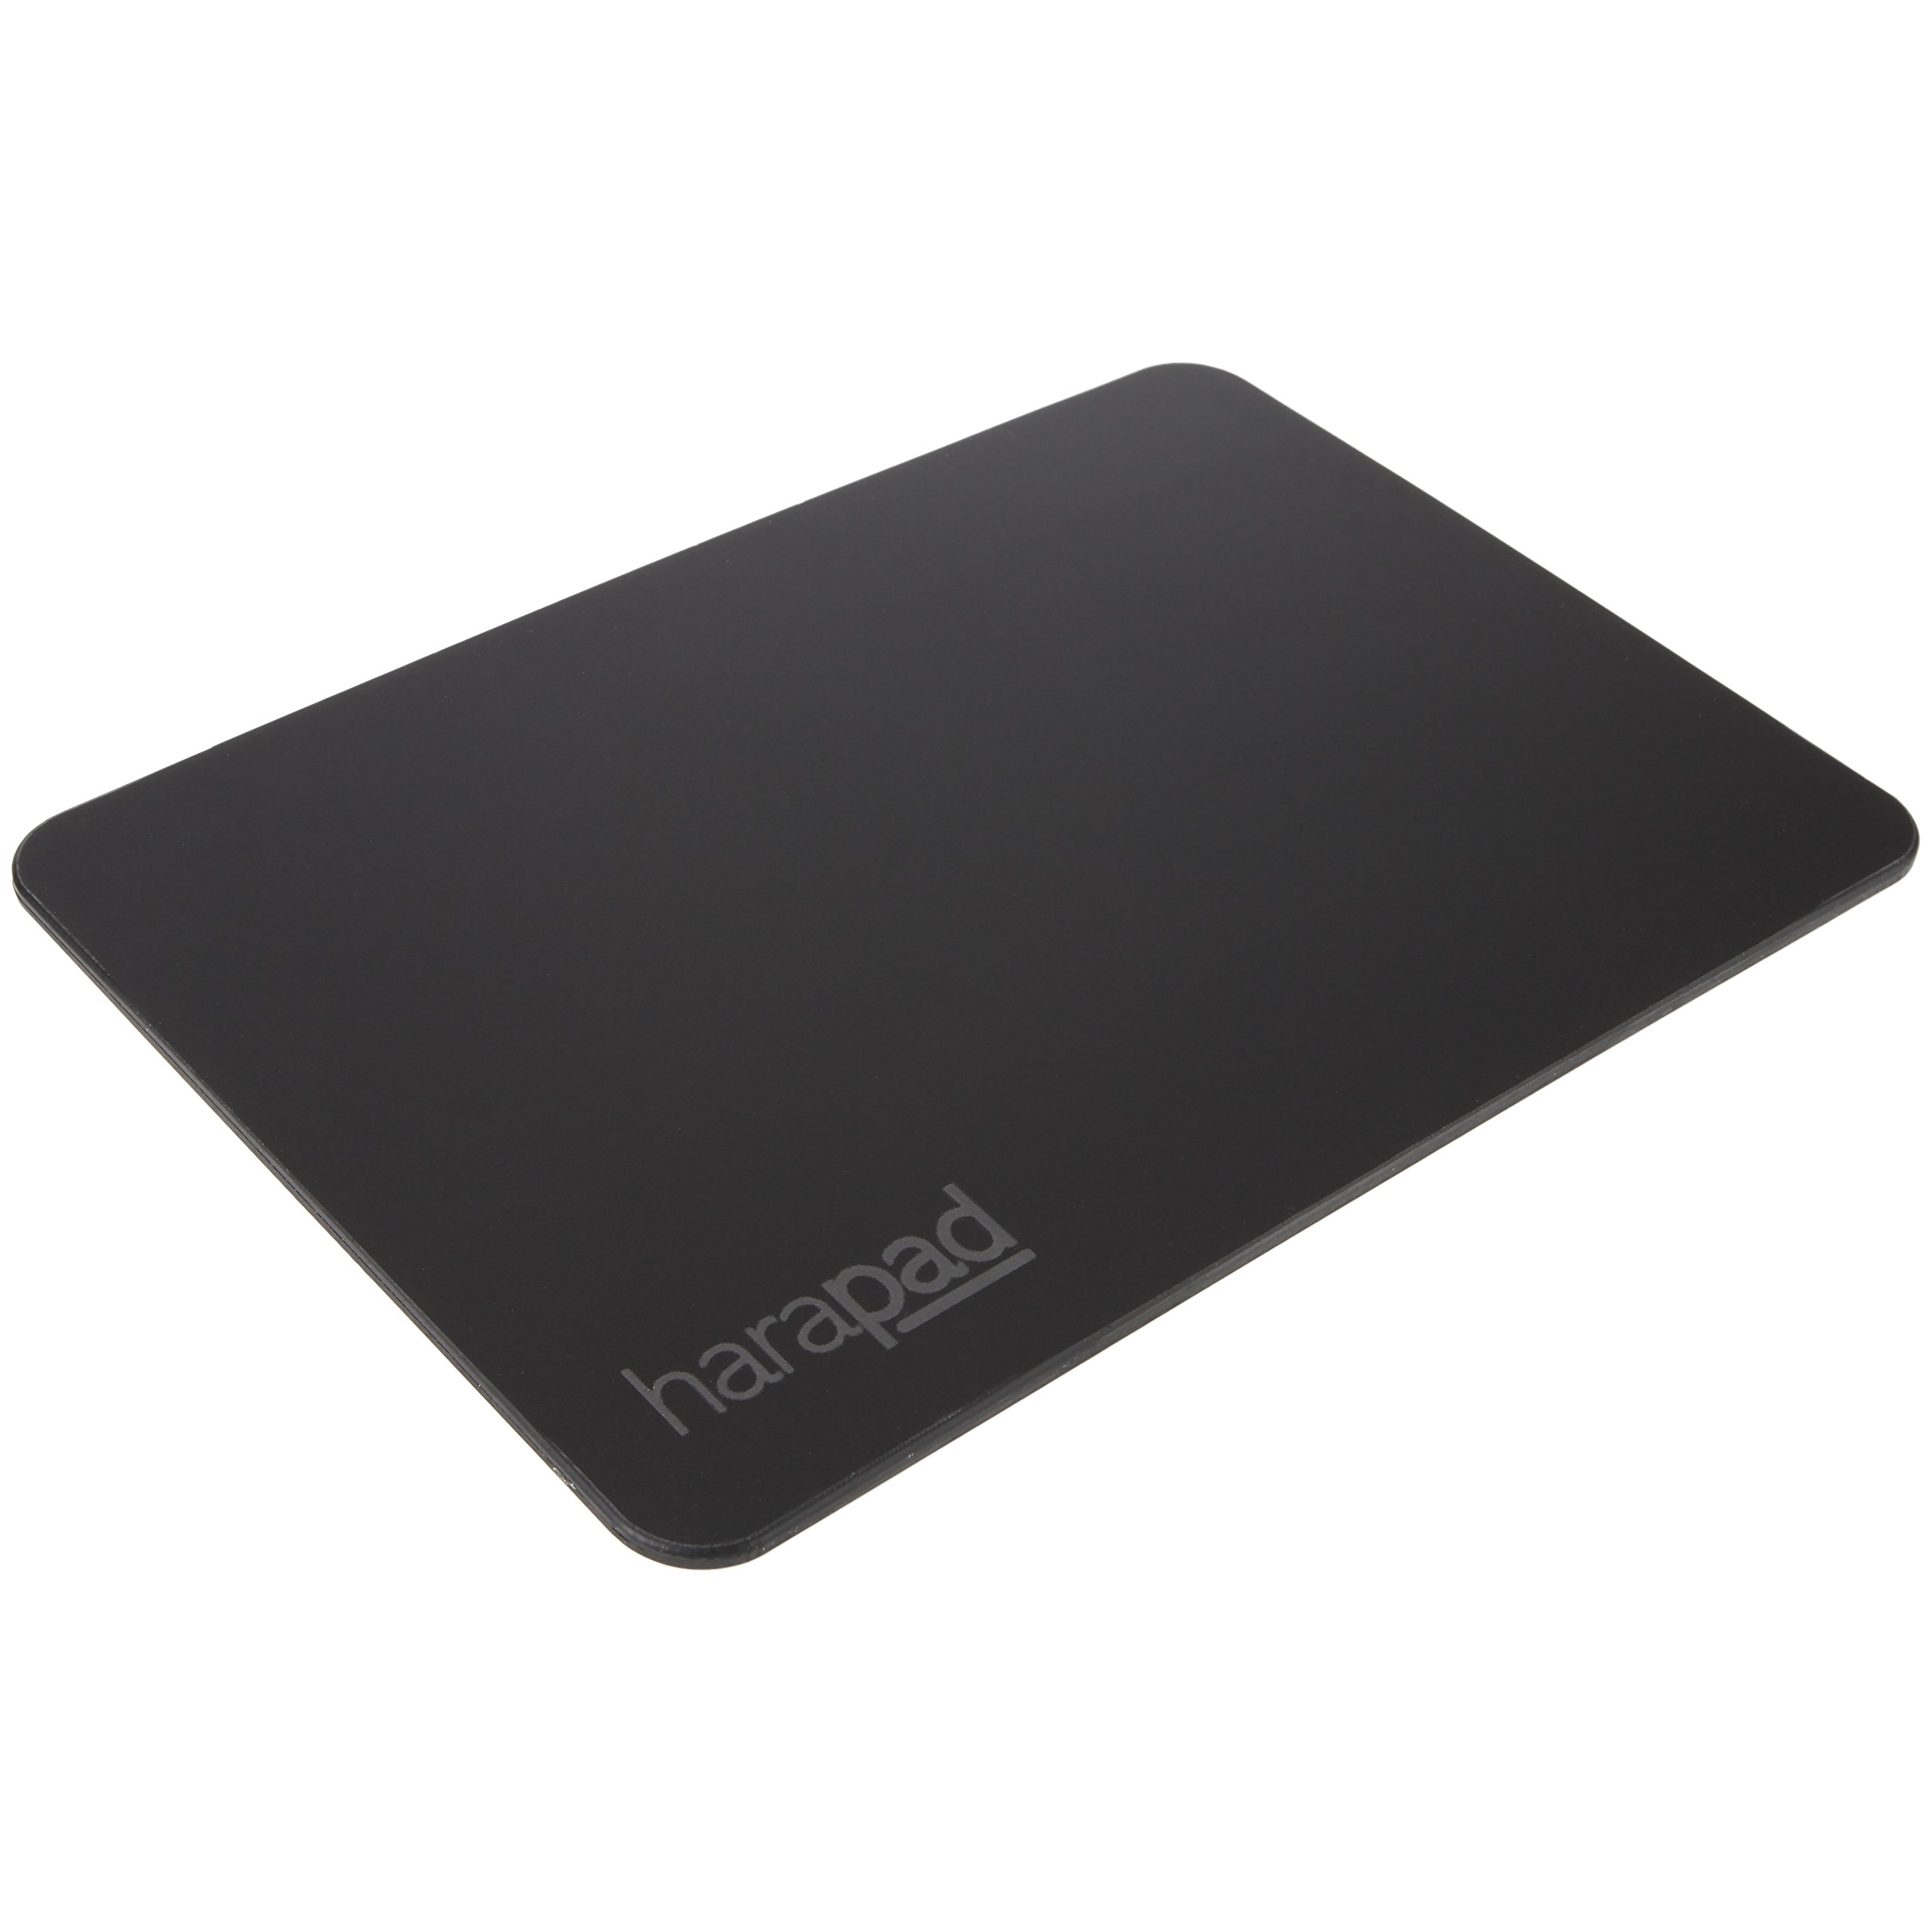 "Laptop EMF Pad Providing EMF and Radiation Protection. Black For 17"" Laptops"